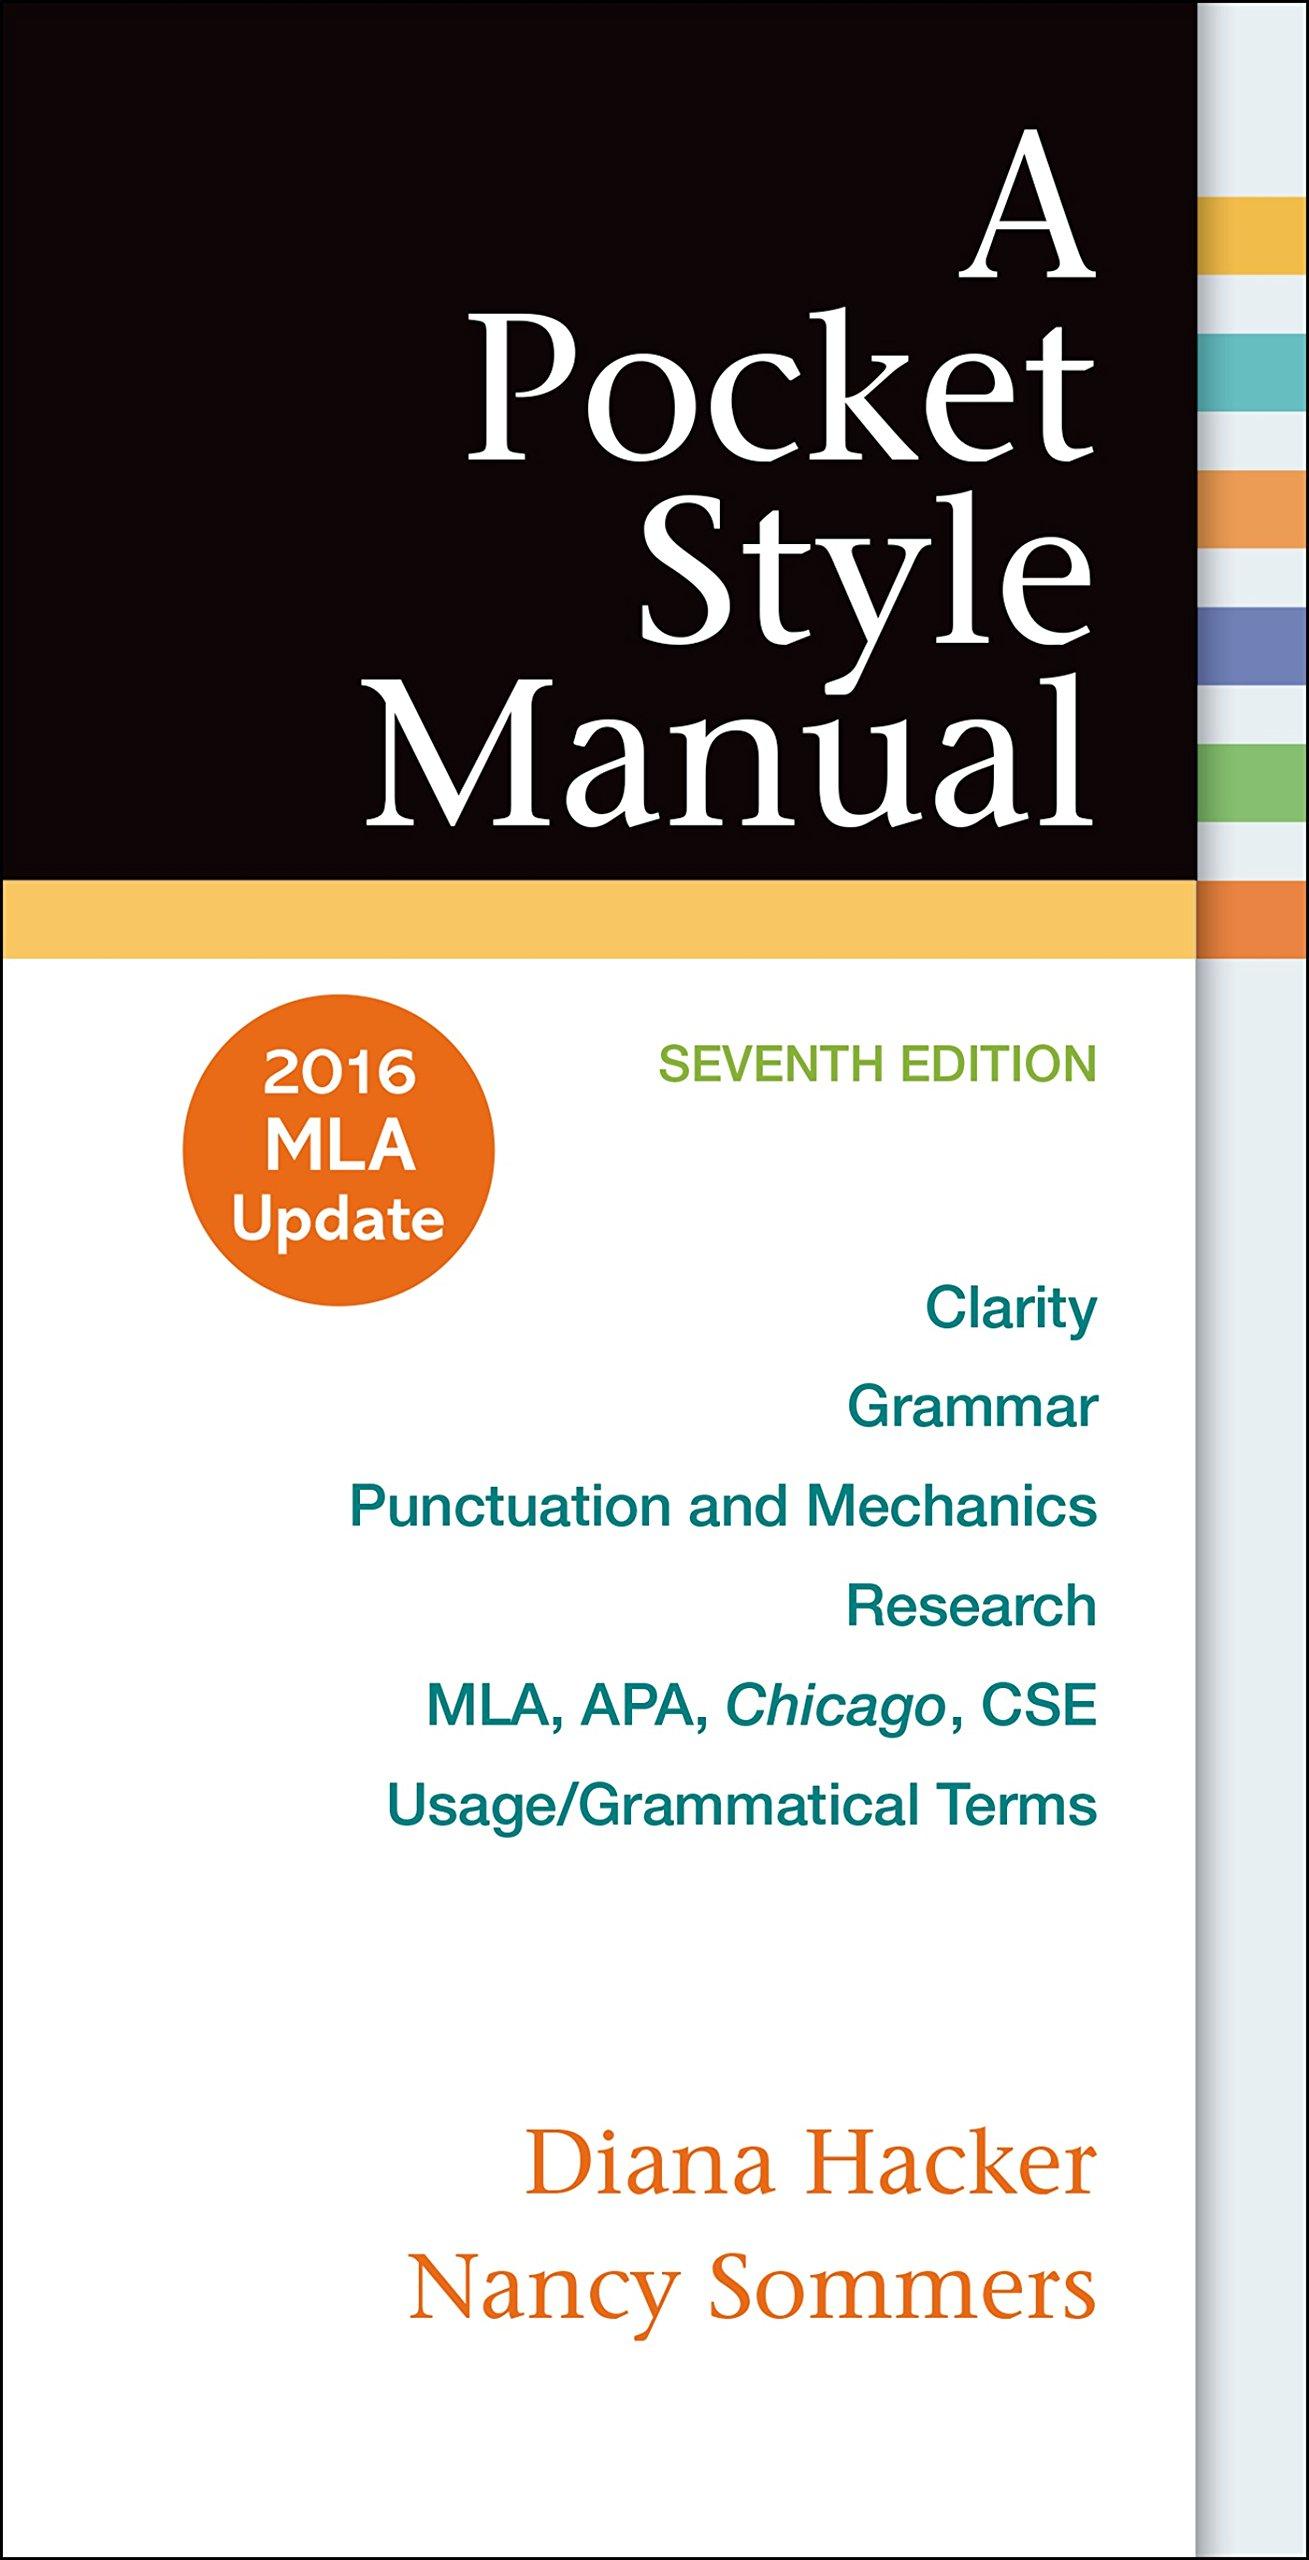 A Pocket Style Manual, 2016 MLA 7th Edition [Diana Hacker A Pocket Style  Manual Seventh Edition] 9781319083526: Diana Hacker: 9788900720495:  Amazon.com: ...